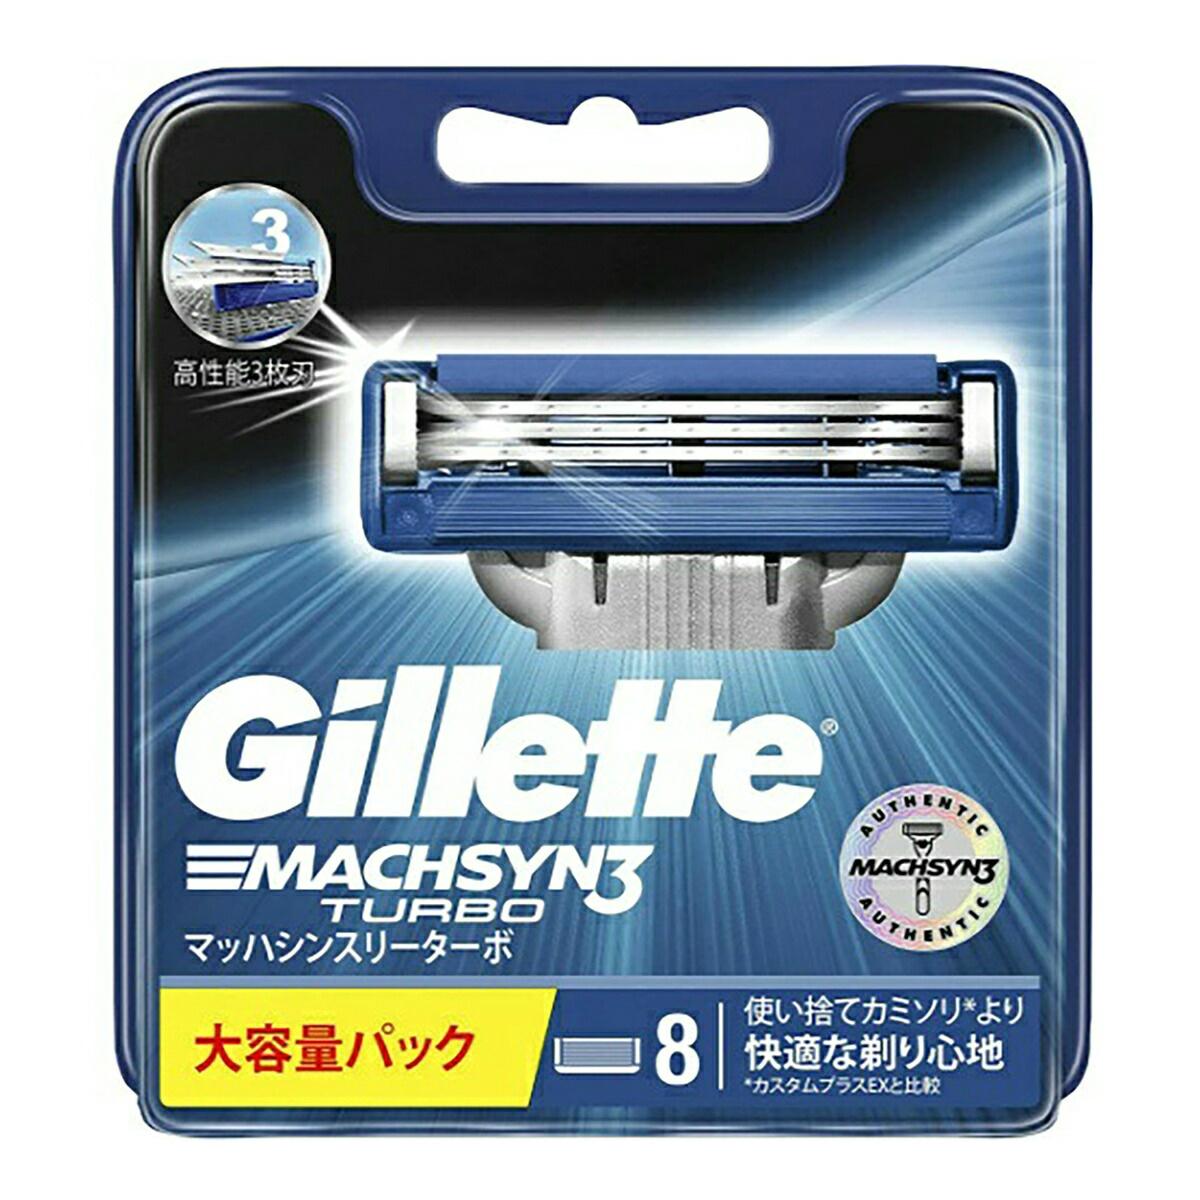 Gillette ジレット M3T-8B 新作入荷 公式ストア マッハシンスリーターボ替刃 深剃り もっと快適に マッハシンスリー 4902430688635 3枚刃 カミソリ 替え刃 替刃 ターボ 8コ入り